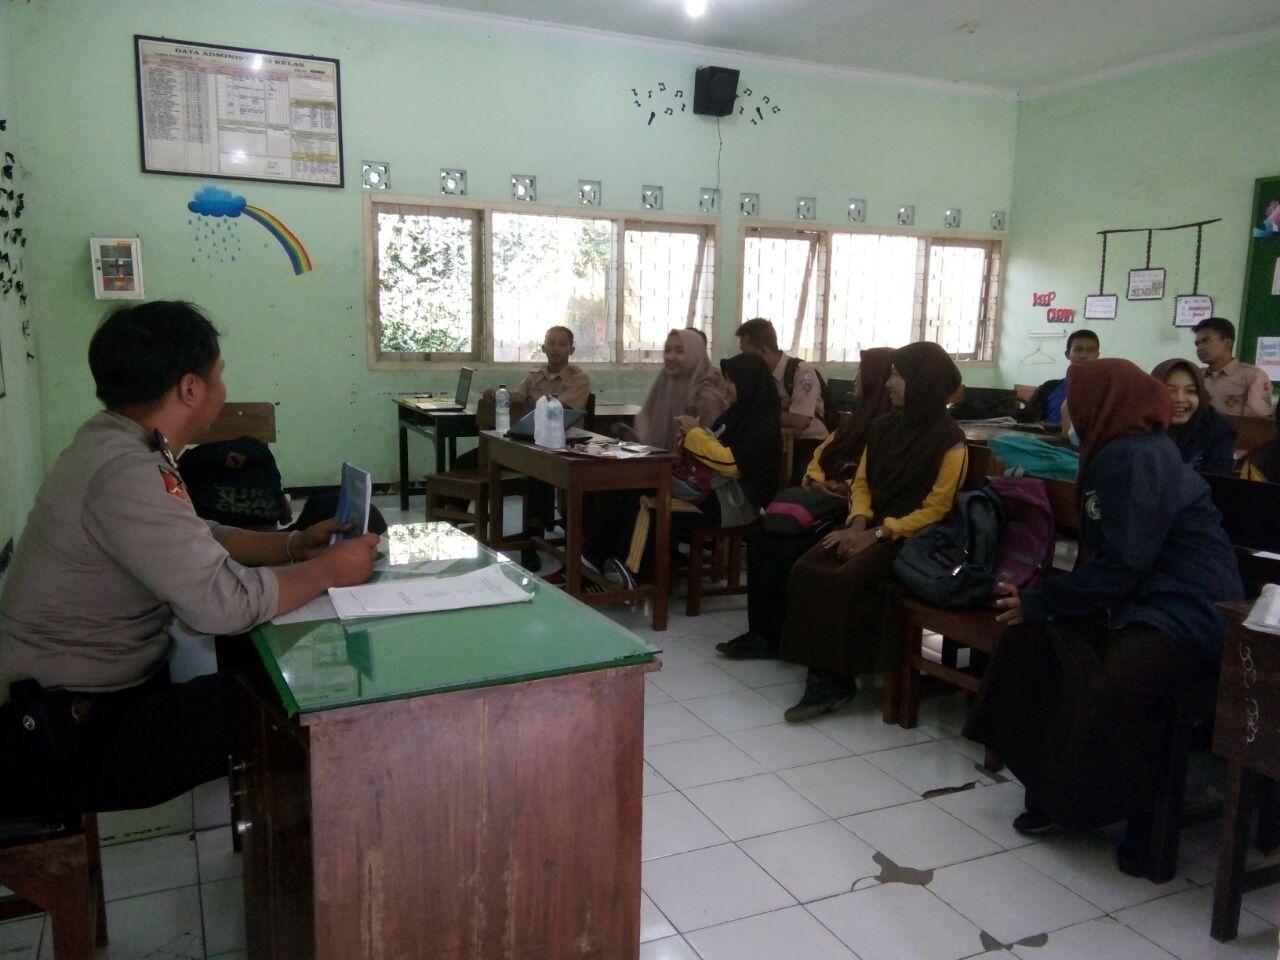 Binmas Polsek Ngantang Polres Batu Sosialisasi Bahaya Narkoba Binmas Desa Pandansari Dekat Dengan Para Pelajar Generasi Bangsa